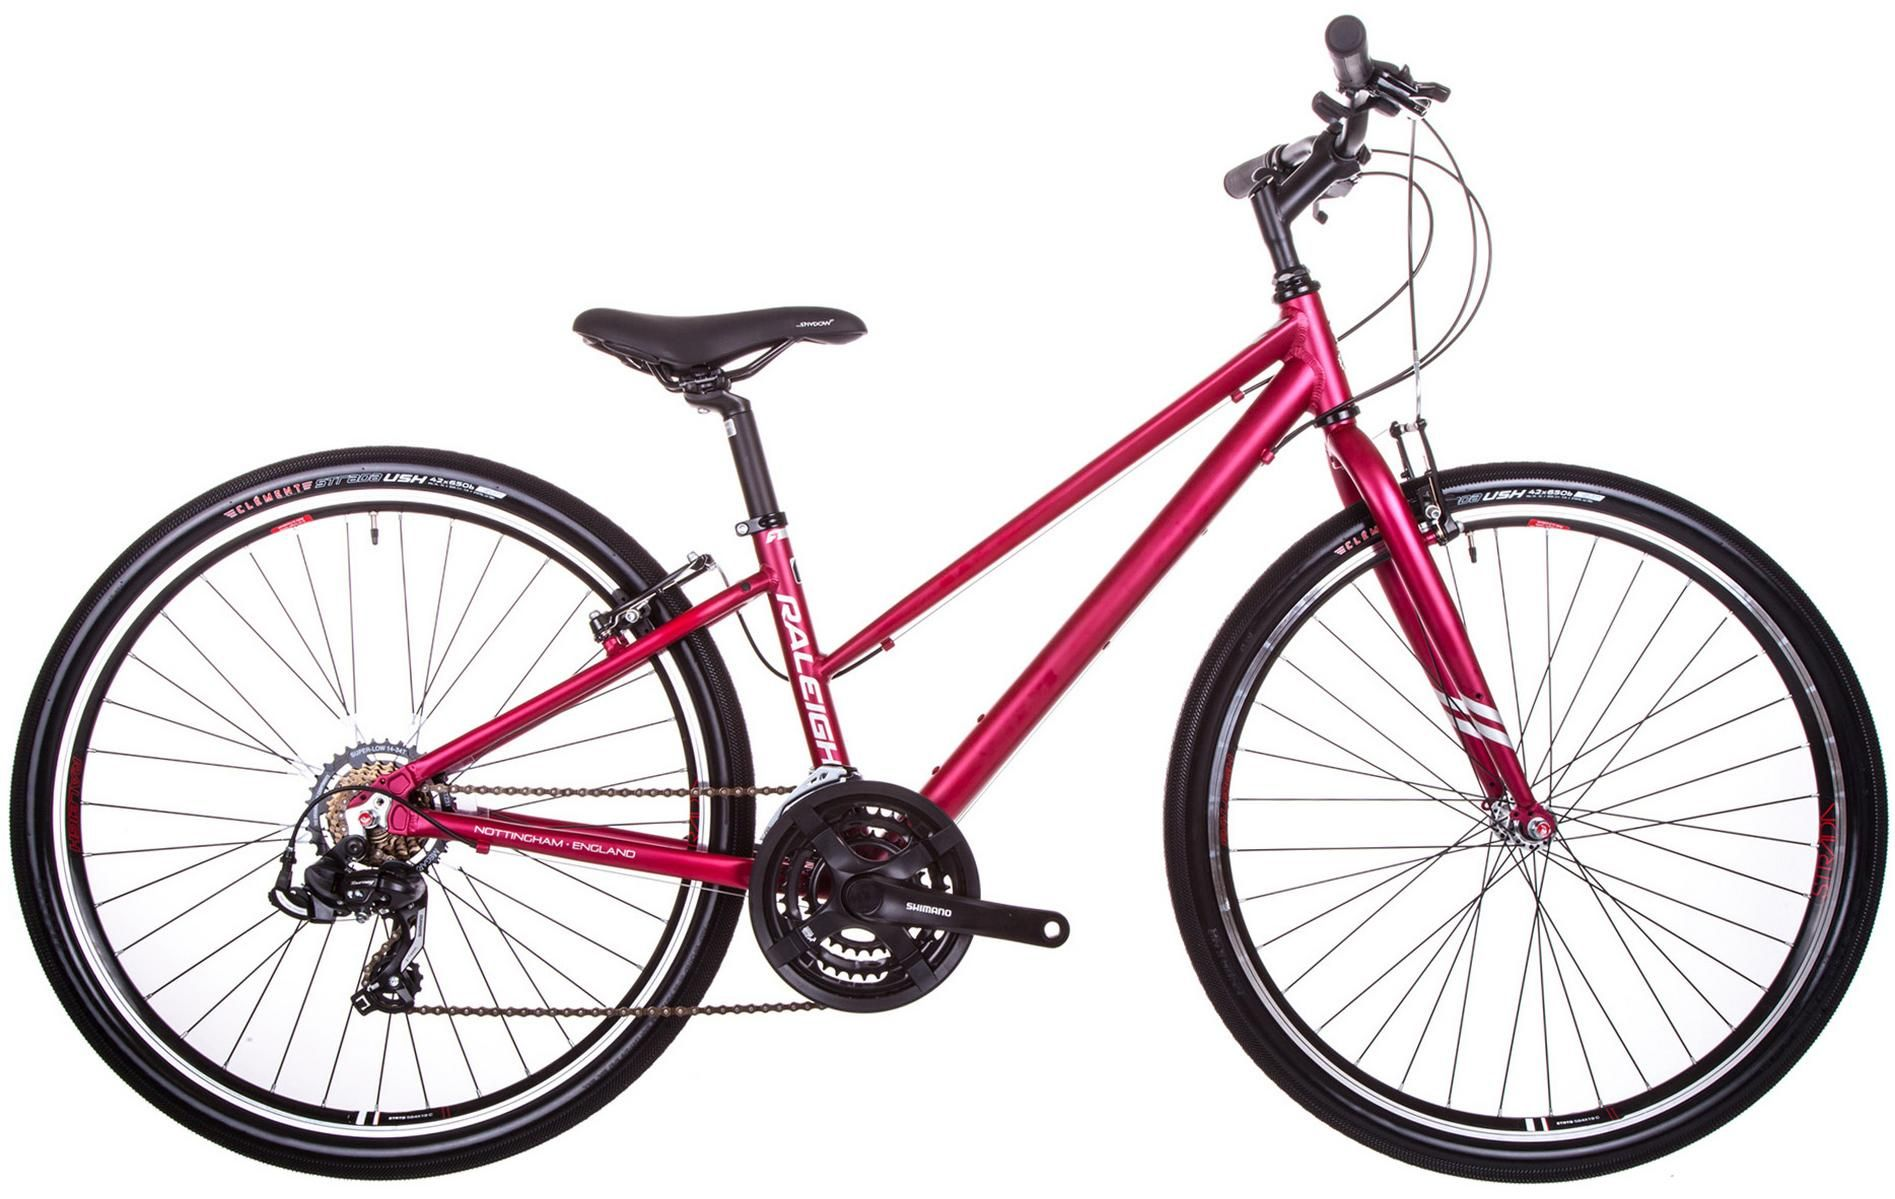 Raleigh Strada 1 Womens Hybrid Bike 14 17 19 21 Frames With